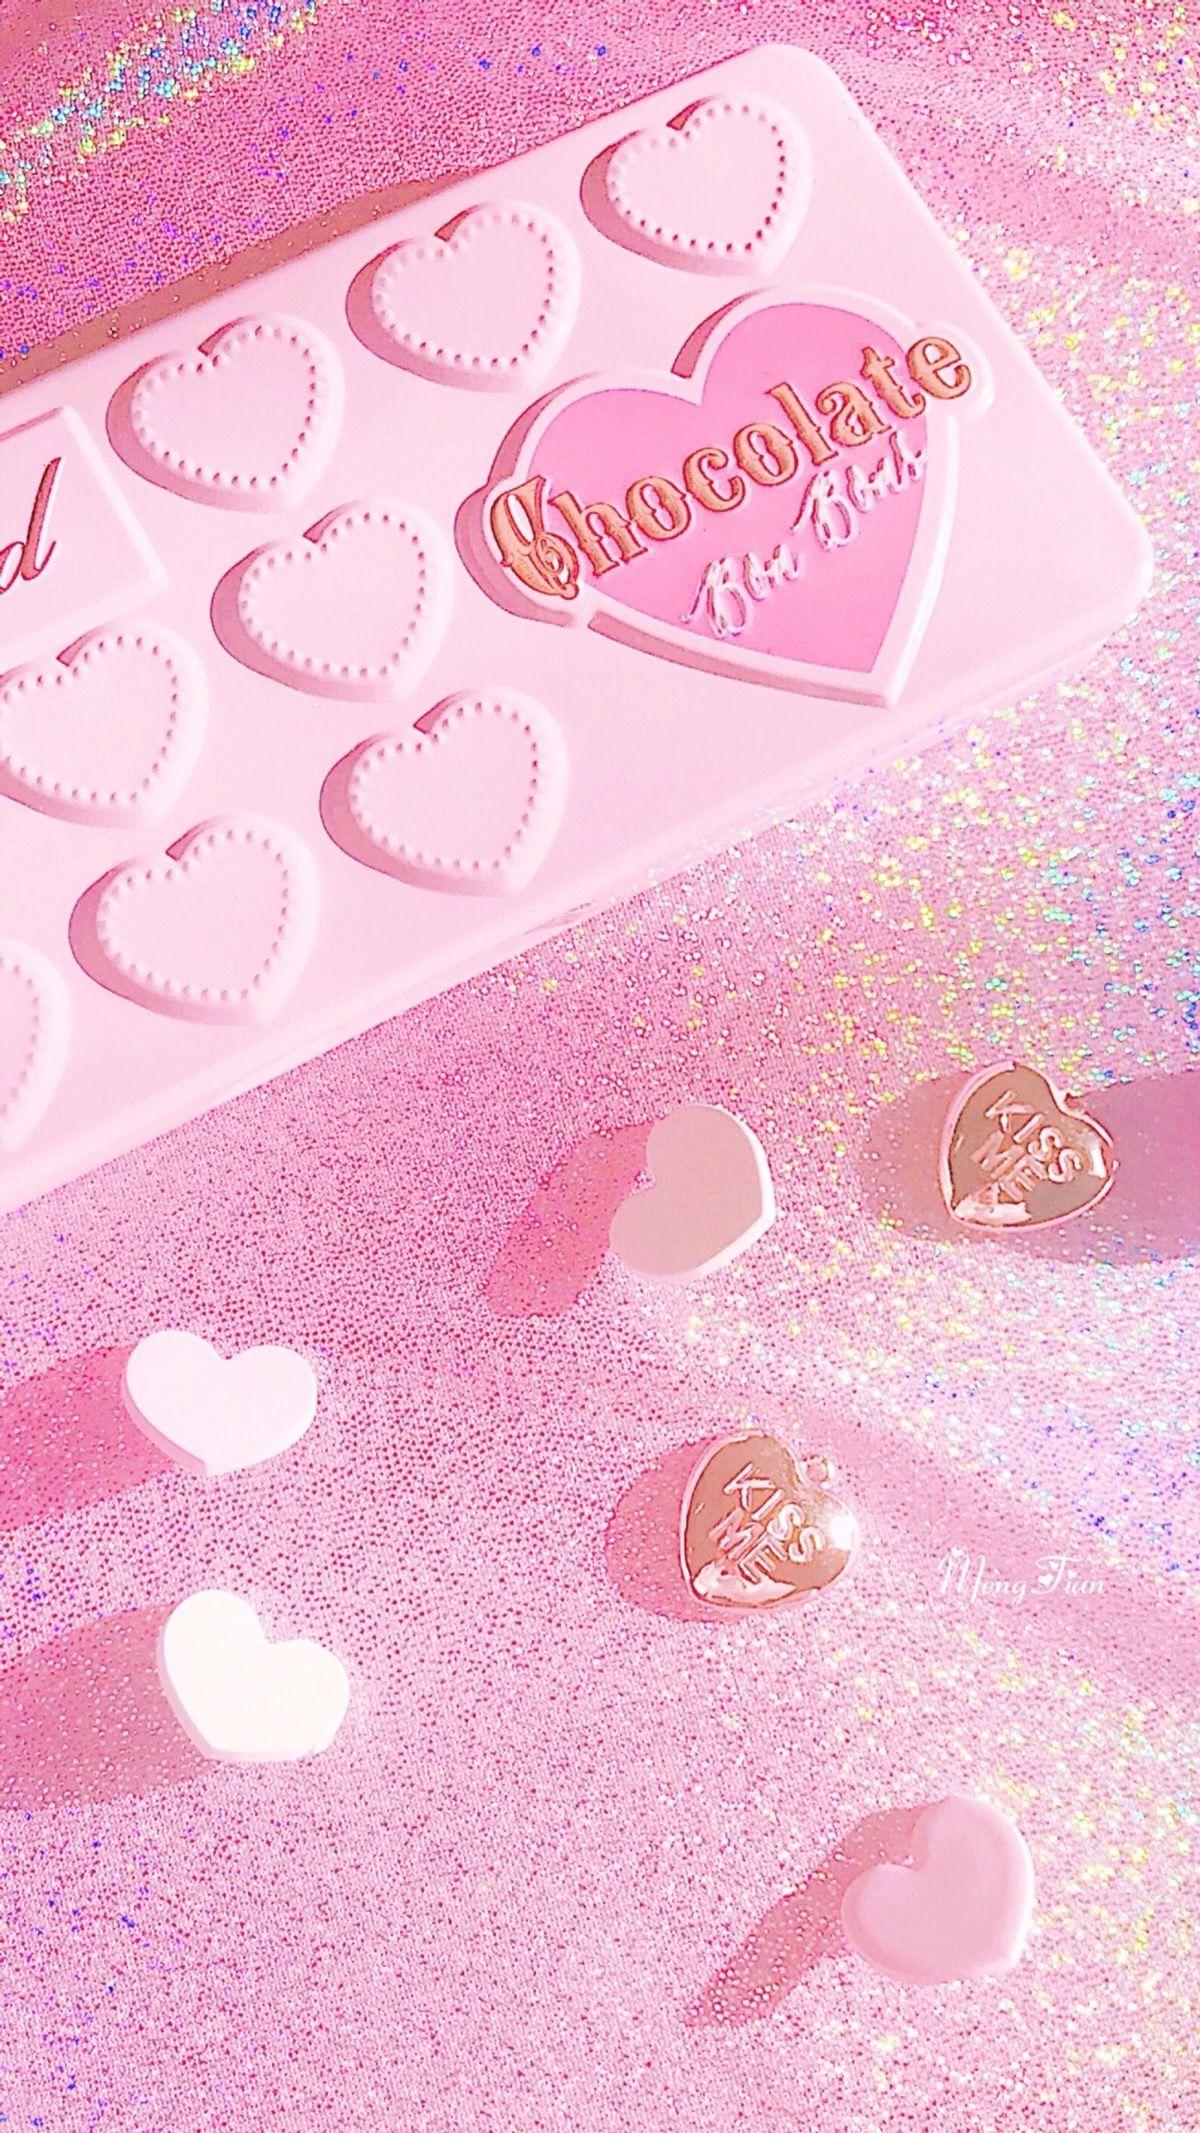 Must see Wallpaper Mobile Barbie - b14dd4b9ccffc65eef61af7f5628e21e  Image_65117.jpg